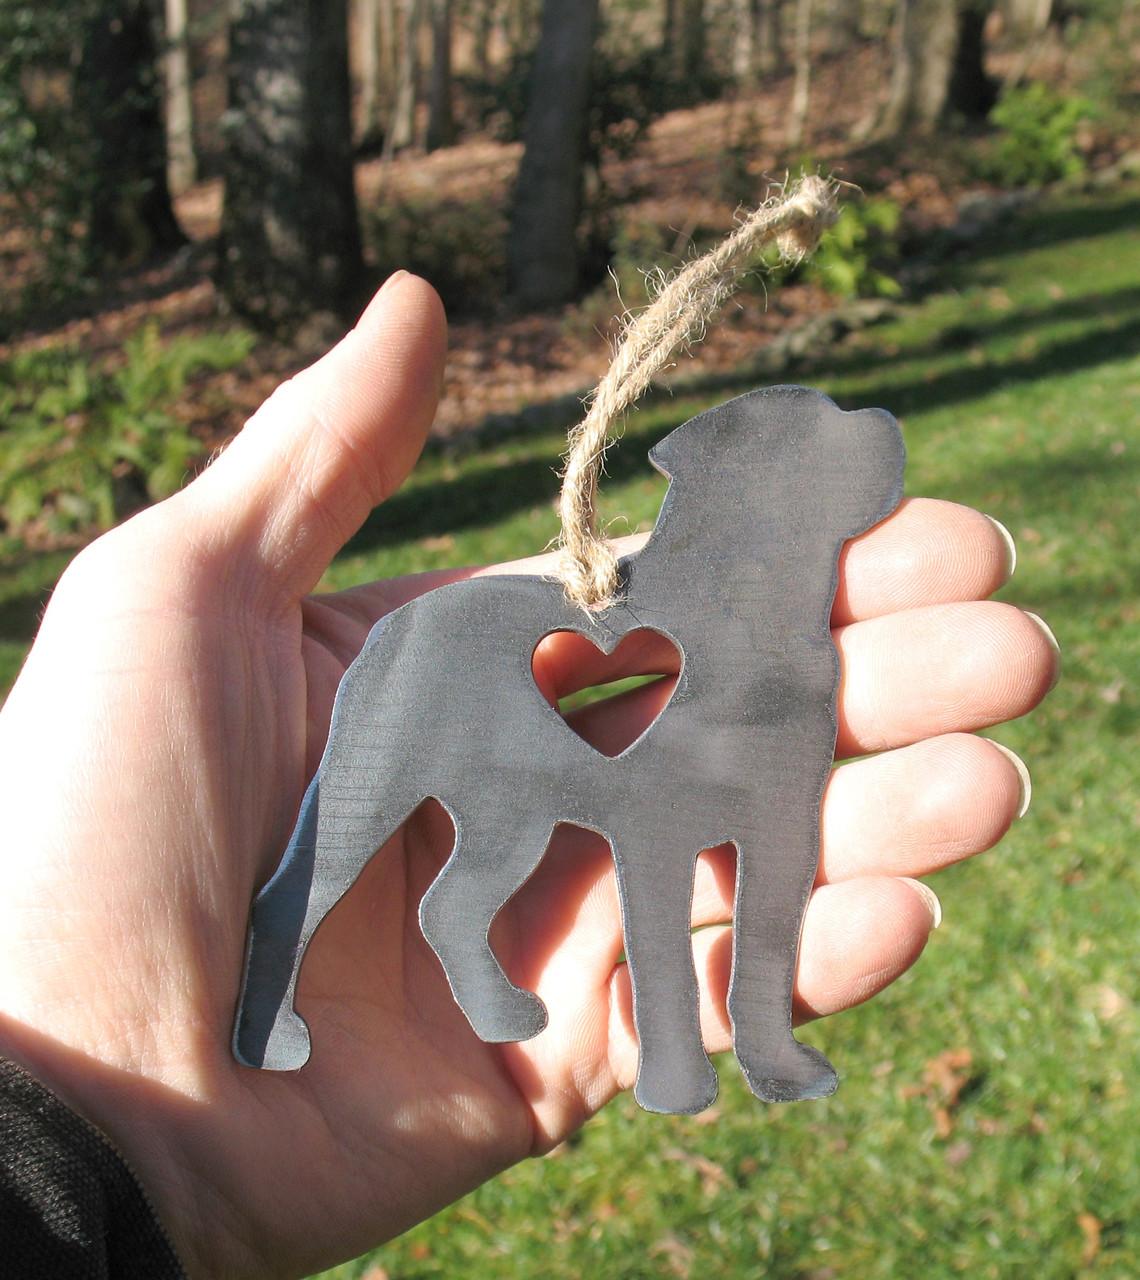 Rottweiler Dog Ornament 1 - Metal Dog Easter Basket Gift for Her Him - Pet Lover Memorial Ornament - Pet Loss Dog Memorial Remembrance Gift